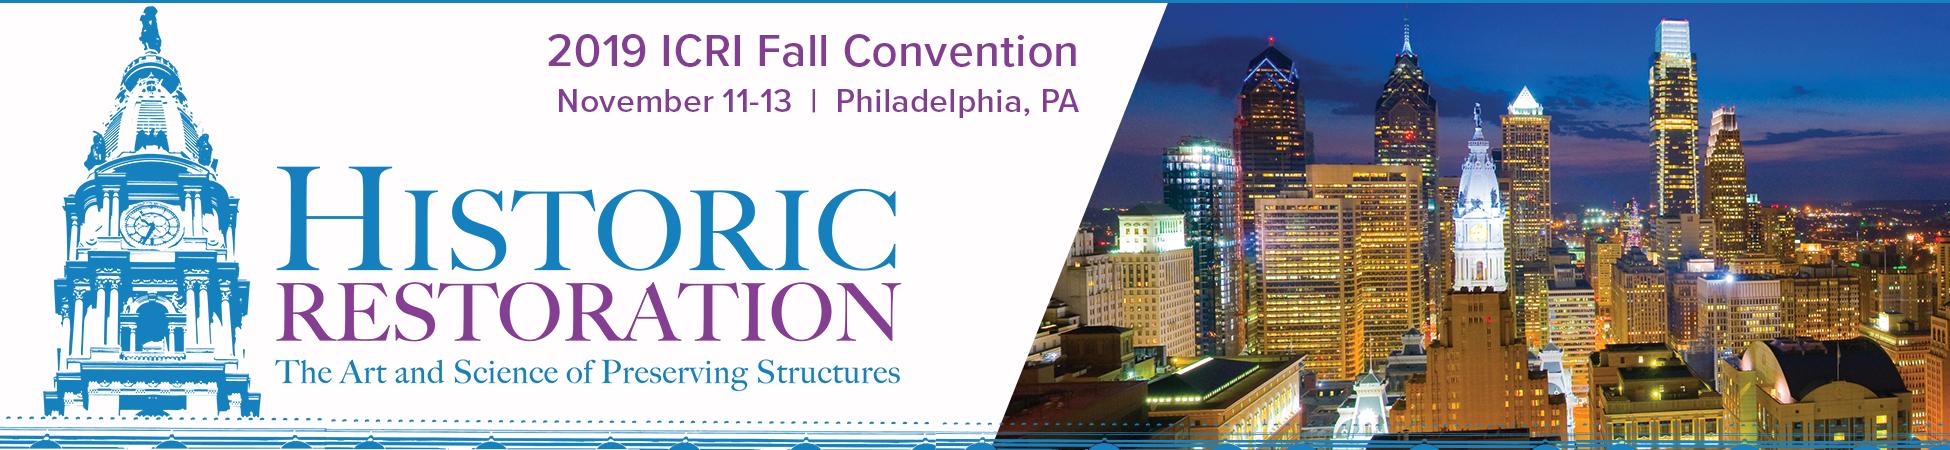 ICRI 2019 Fall Convention